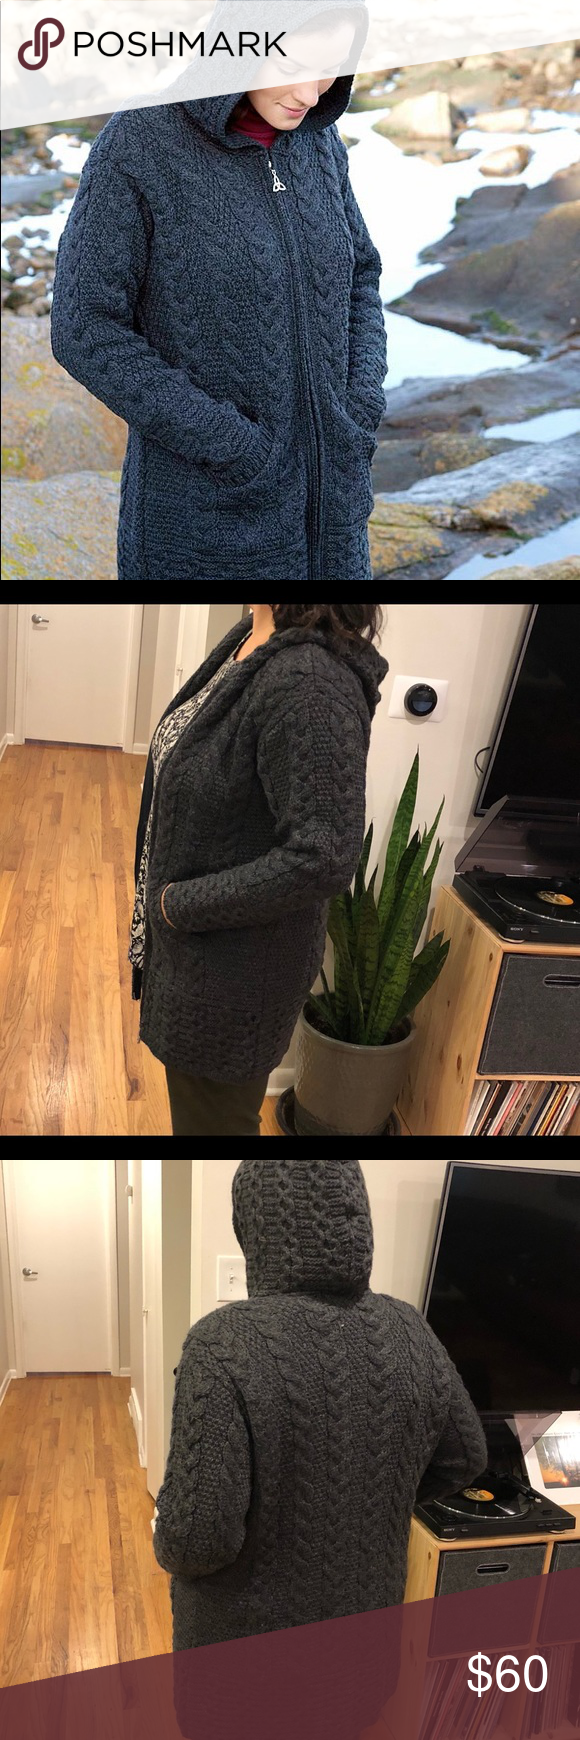 33++ Aran crafts sweater size chart information